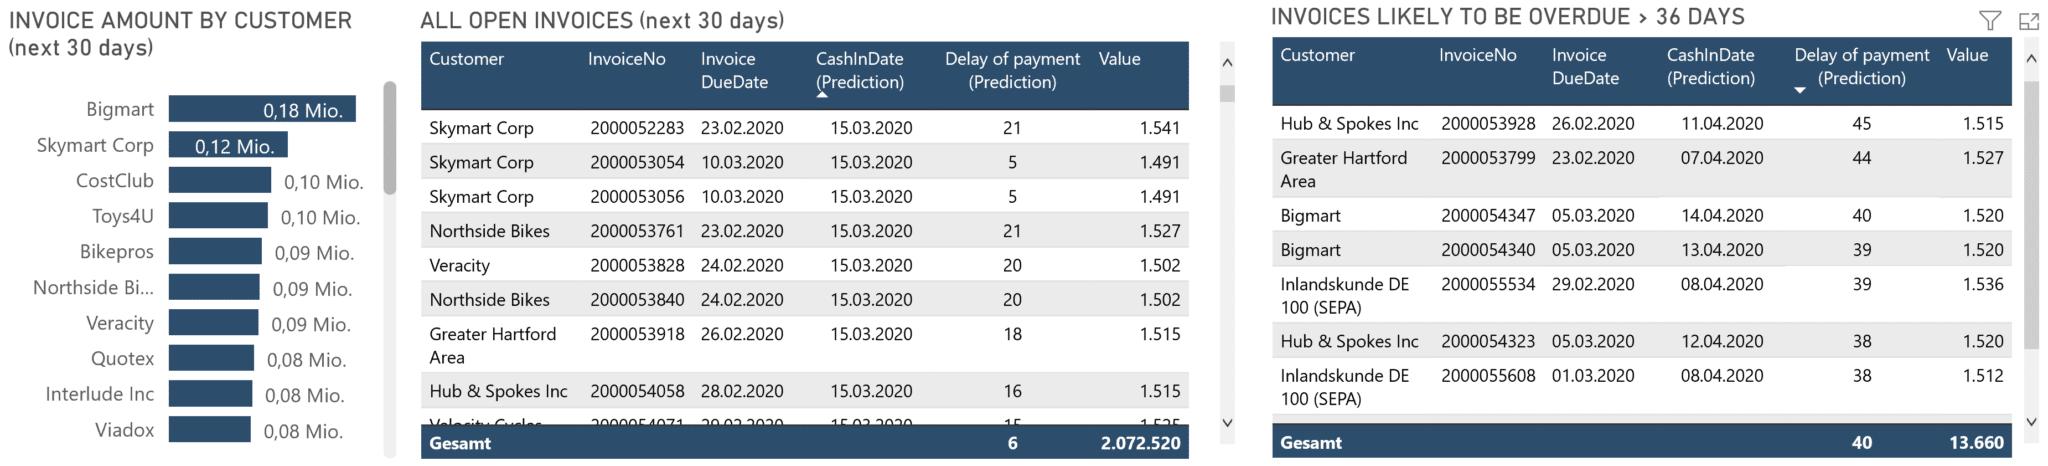 Cash-Invoice-cy-customer